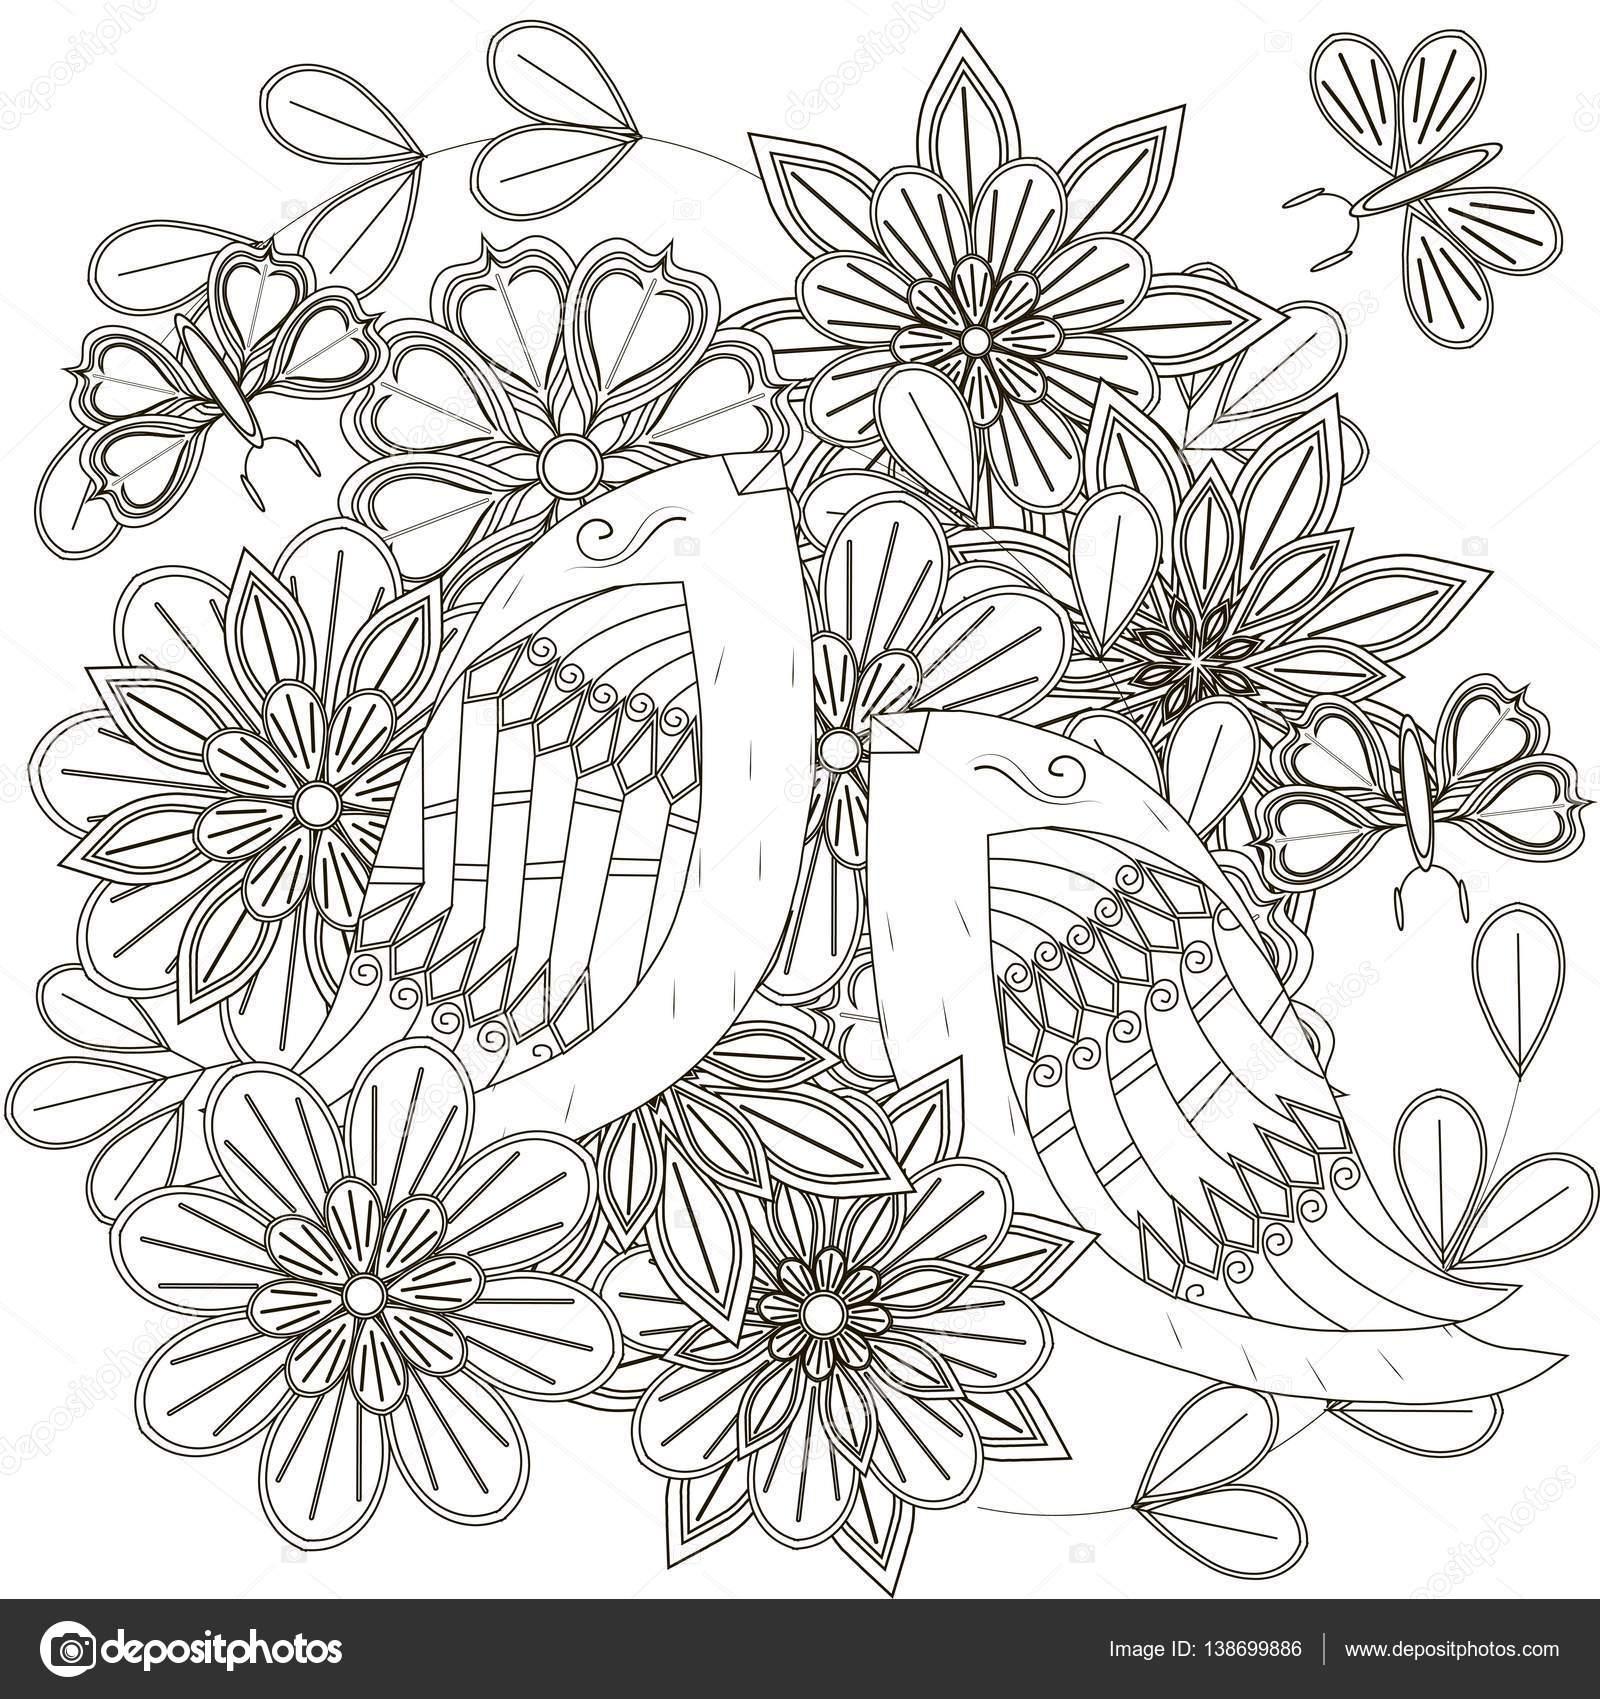 1600x1699 Black White Sketch Of Bouquet With Birds, Stylized Flowers